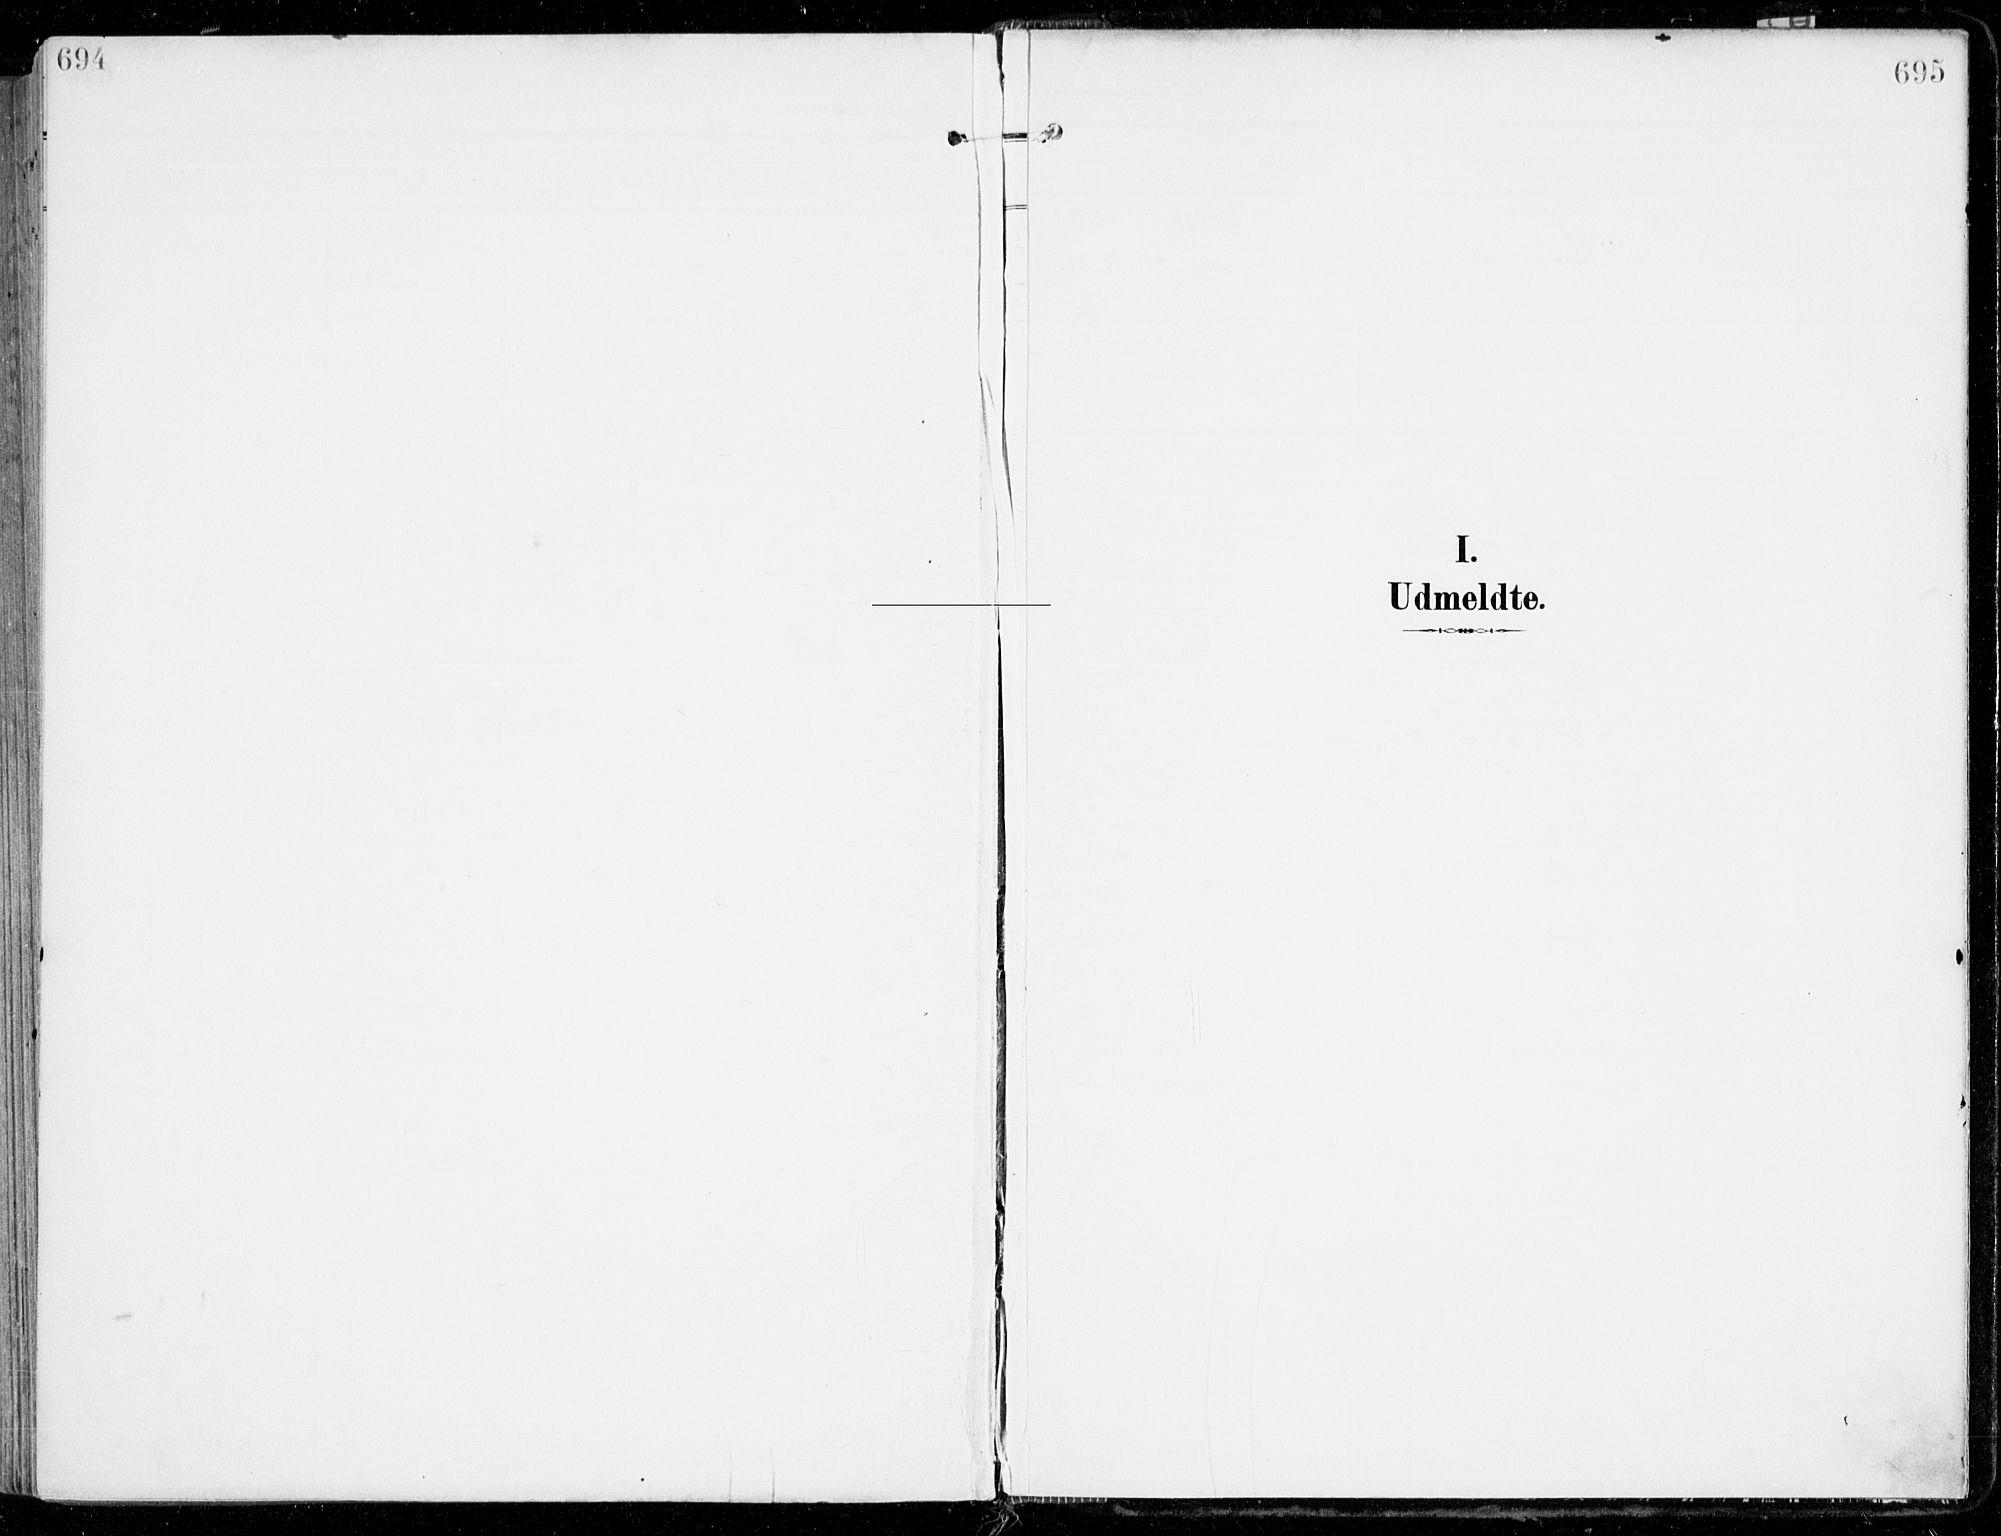 SAKO, Sem kirkebøker, F/Fb/L0006: Parish register (official) no. II 6, 1905-1918, p. 694-695